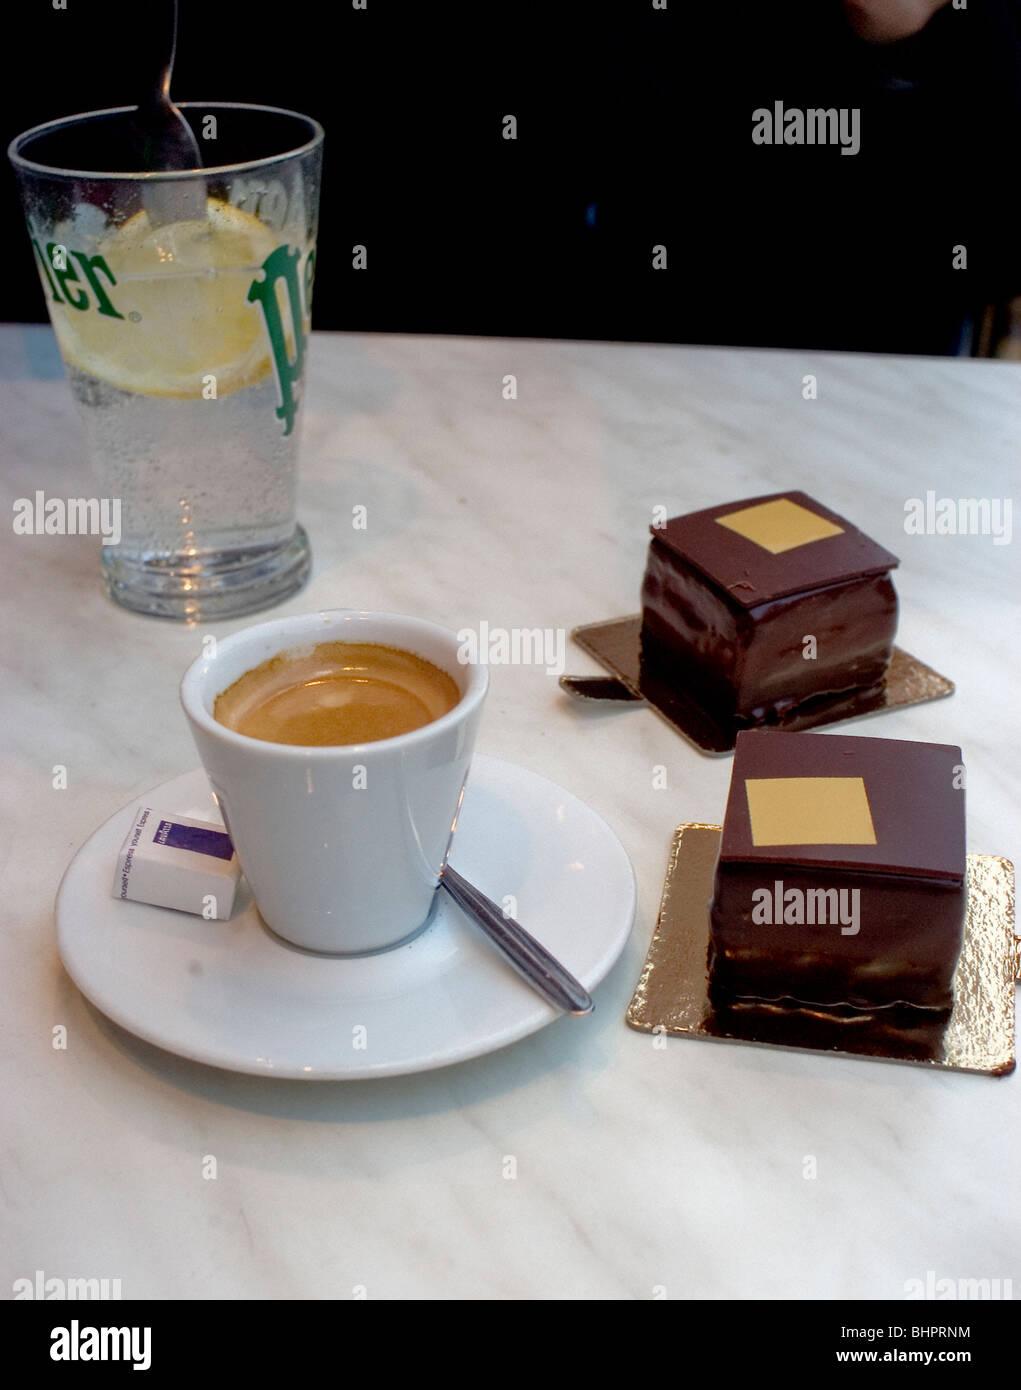 Paris, France, Close up Food, Luxury, Chocolate Cakes and Espresso Coffee , Pierre Hermé, - Stock Image